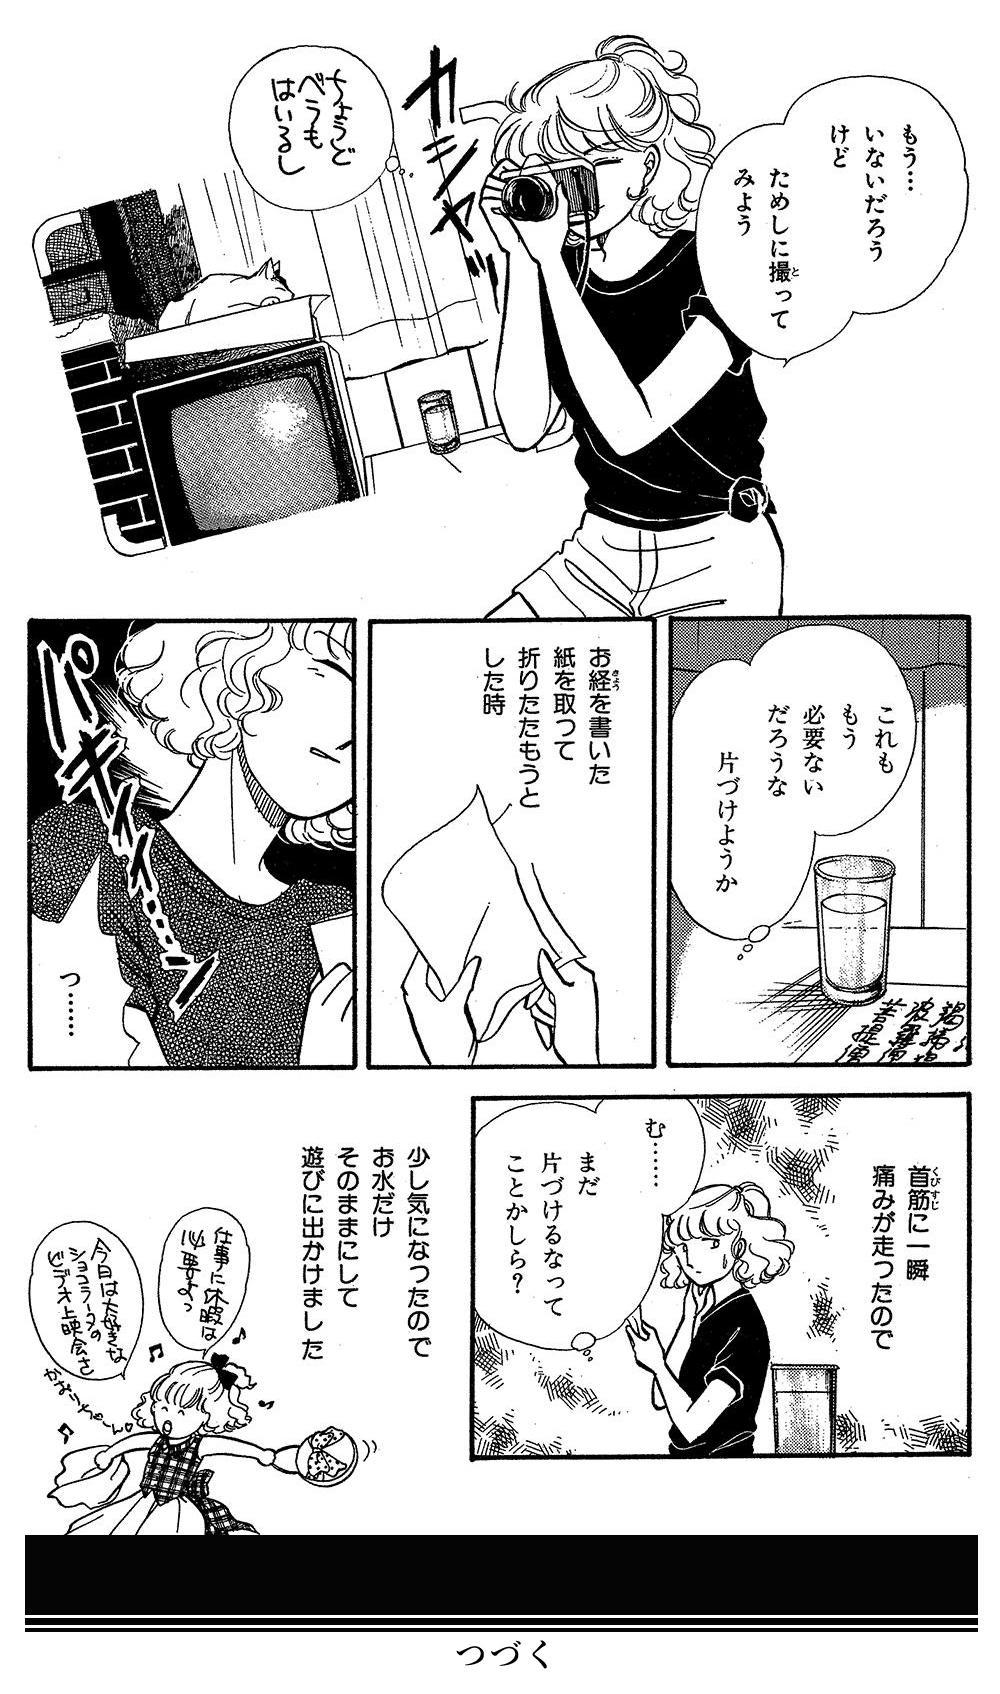 mayuri2-1-10.jpg